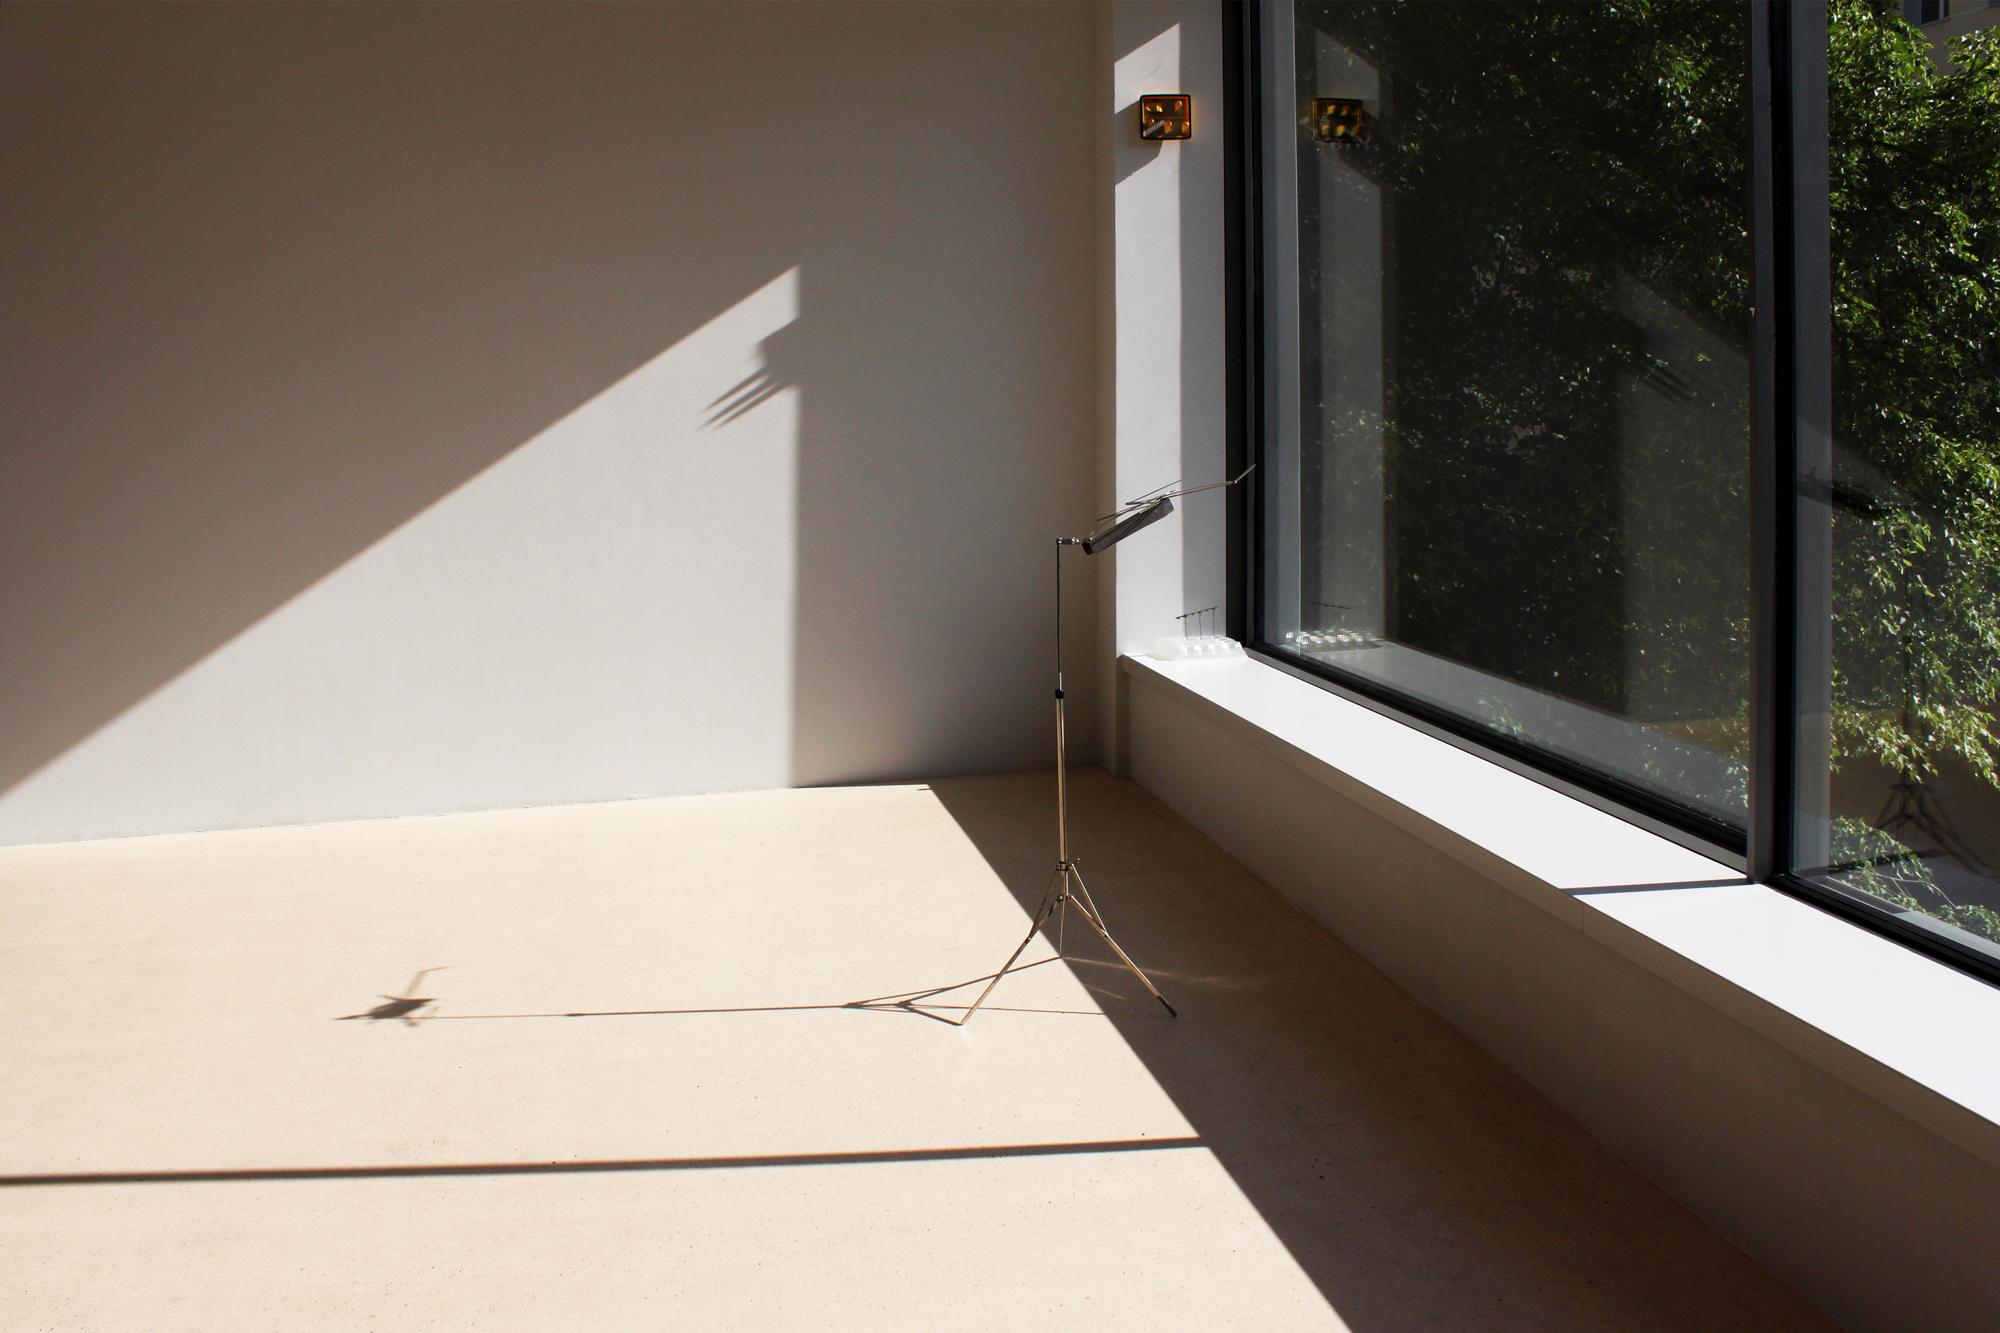 urbanbacklog-warsaw-foksal-gallery-7.jpg